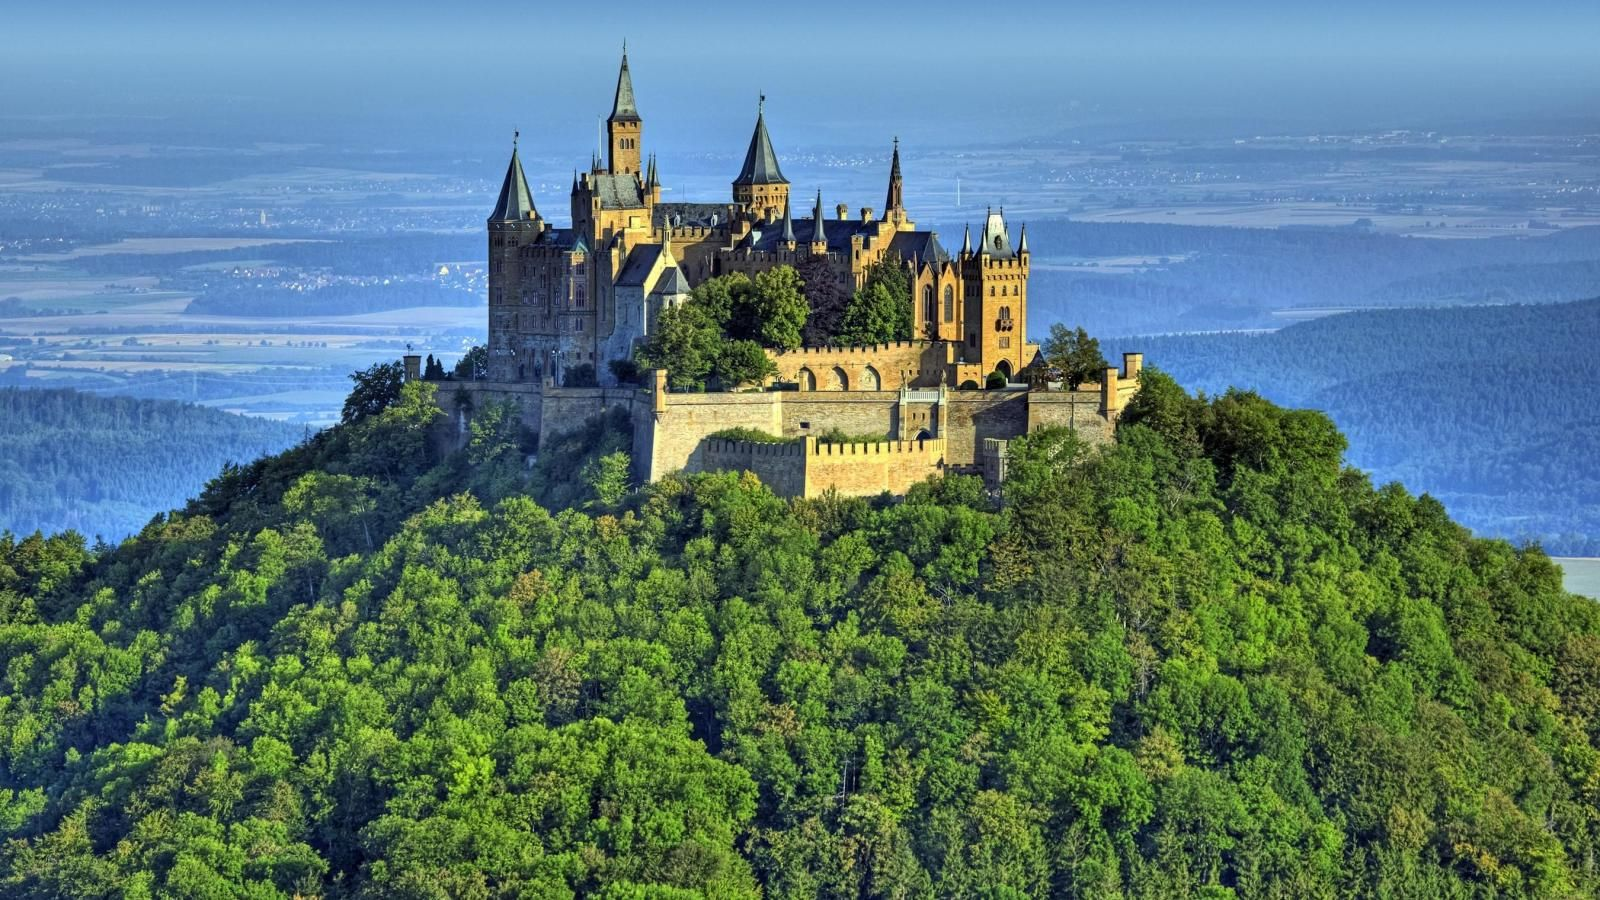 Https Hqwallbase Site Images Bigest 1600x900 Forest Building Hohenzollern Landscape Castle 185947 Jpg Deutschland Burgen Schloss Sigmaringen Burg